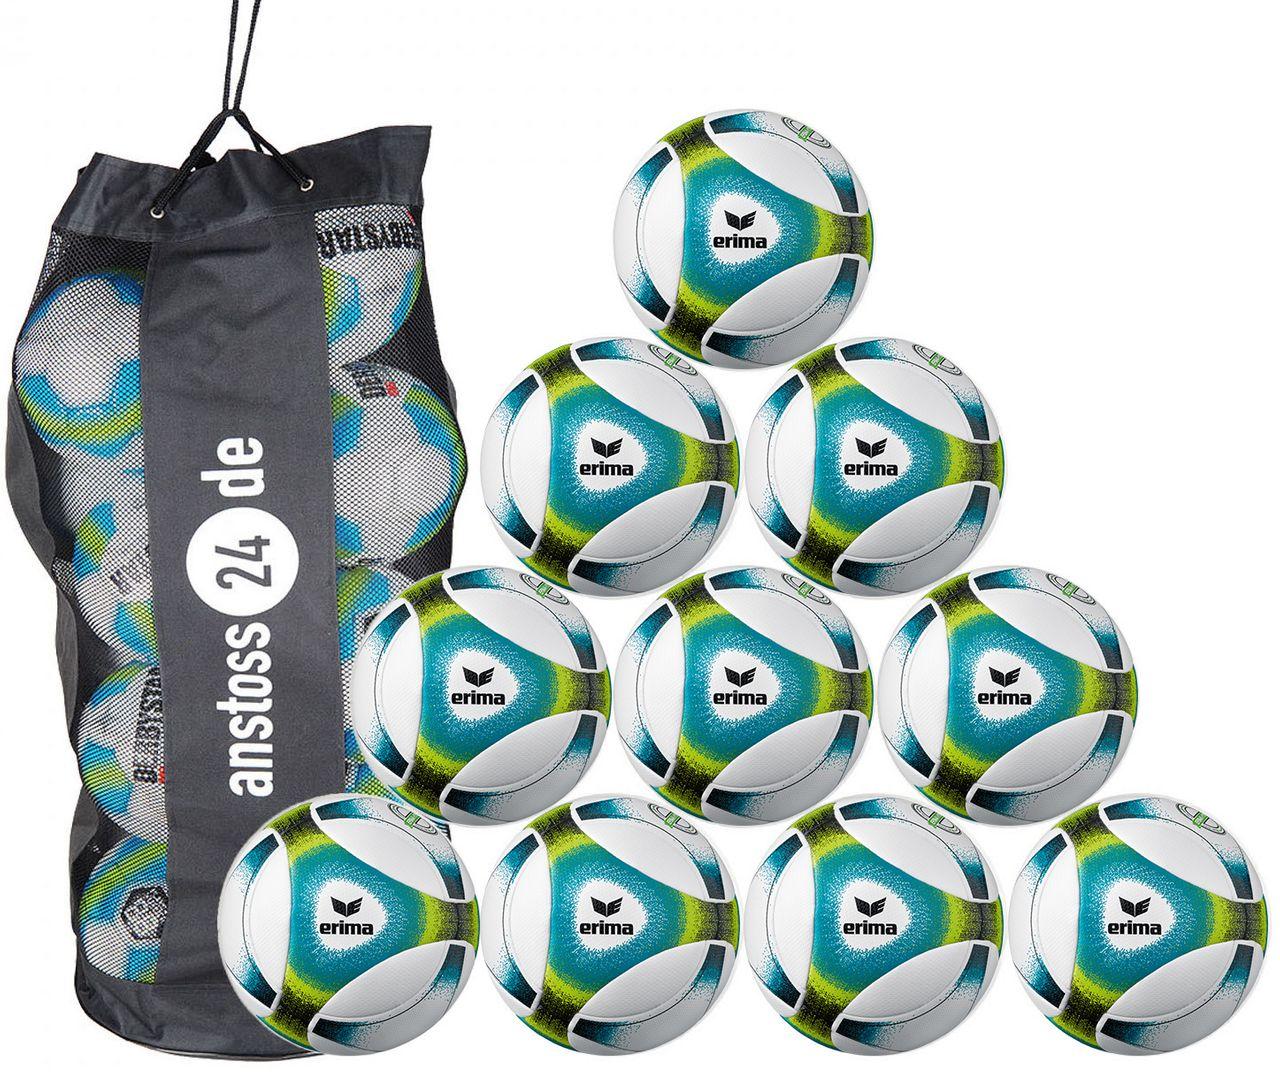 10 x erima training ball Futsal Hybrid SNR 2019 incl. ball bag